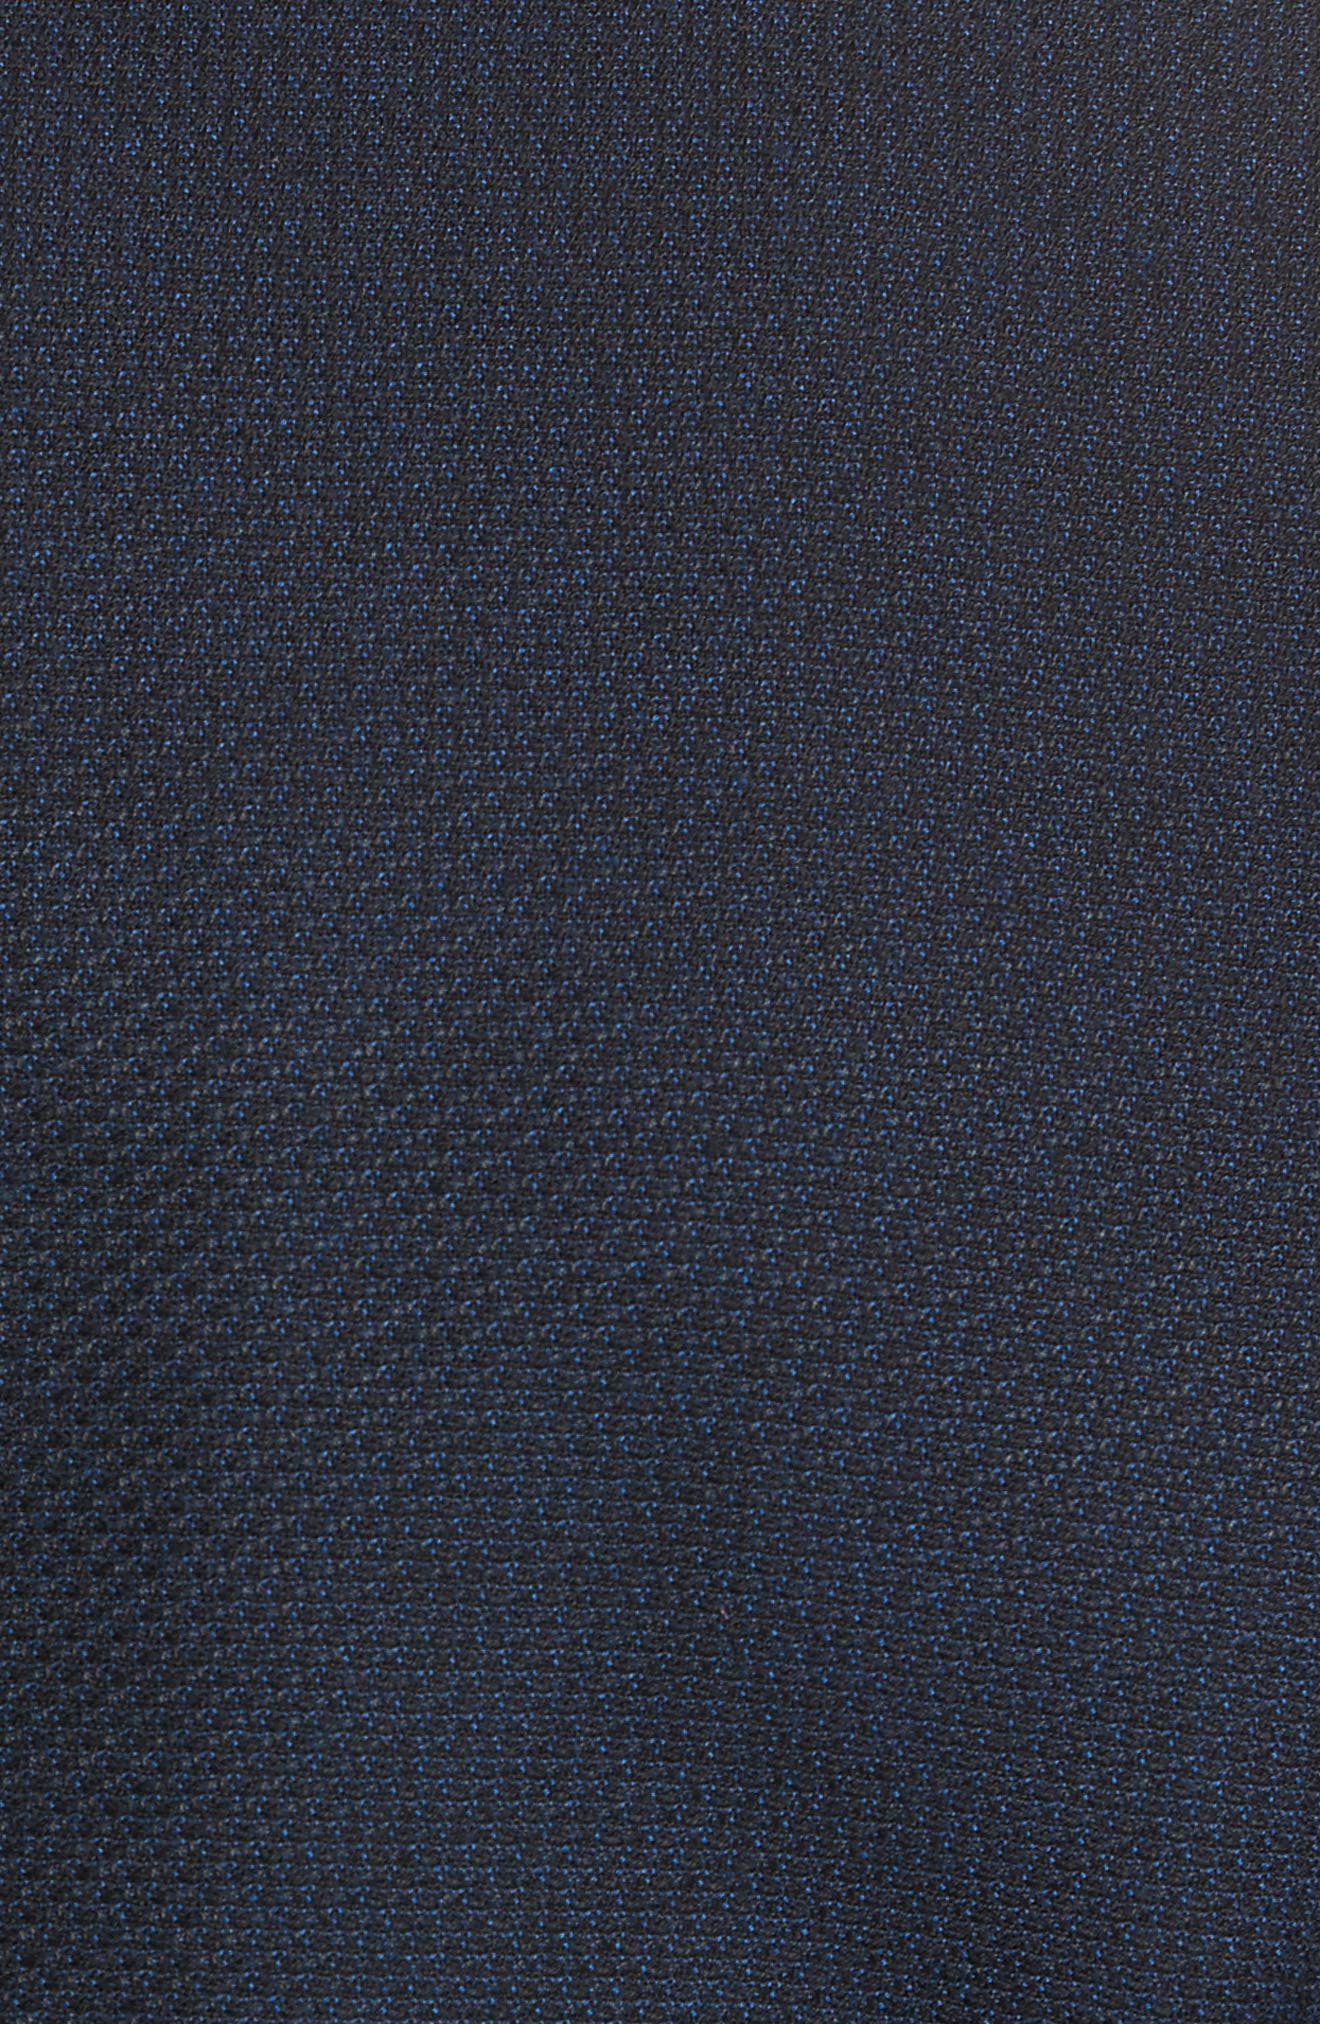 Olsson Textured Sport Coat,                             Alternate thumbnail 5, color,                             Navy